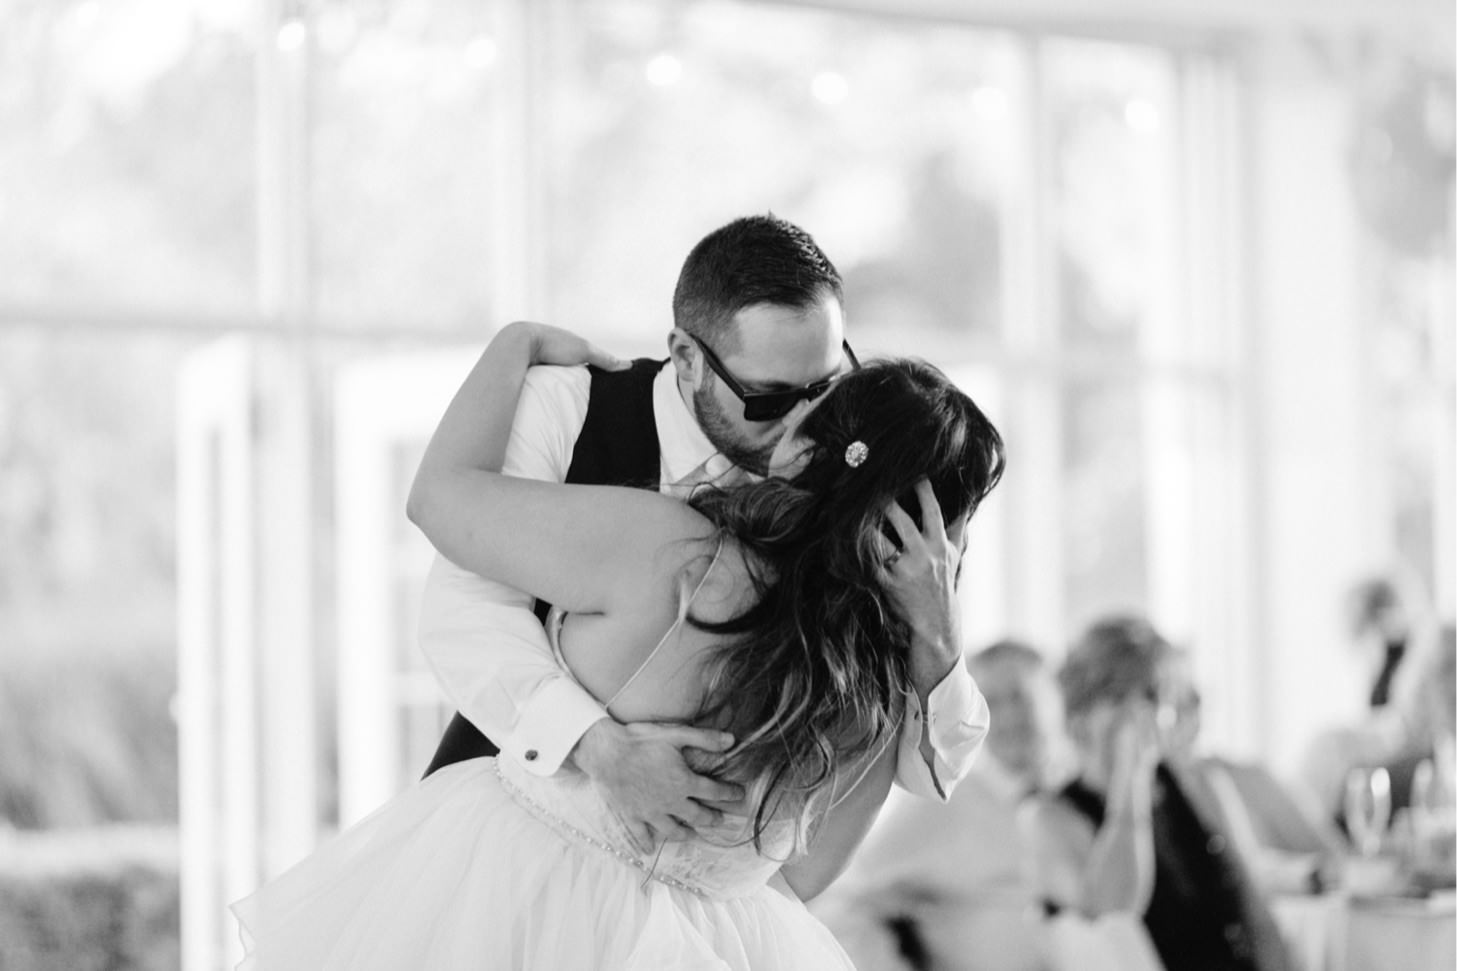 ritz-charles-wedding-reception-downtown-indianapolis-wedding-photographer049.JPG